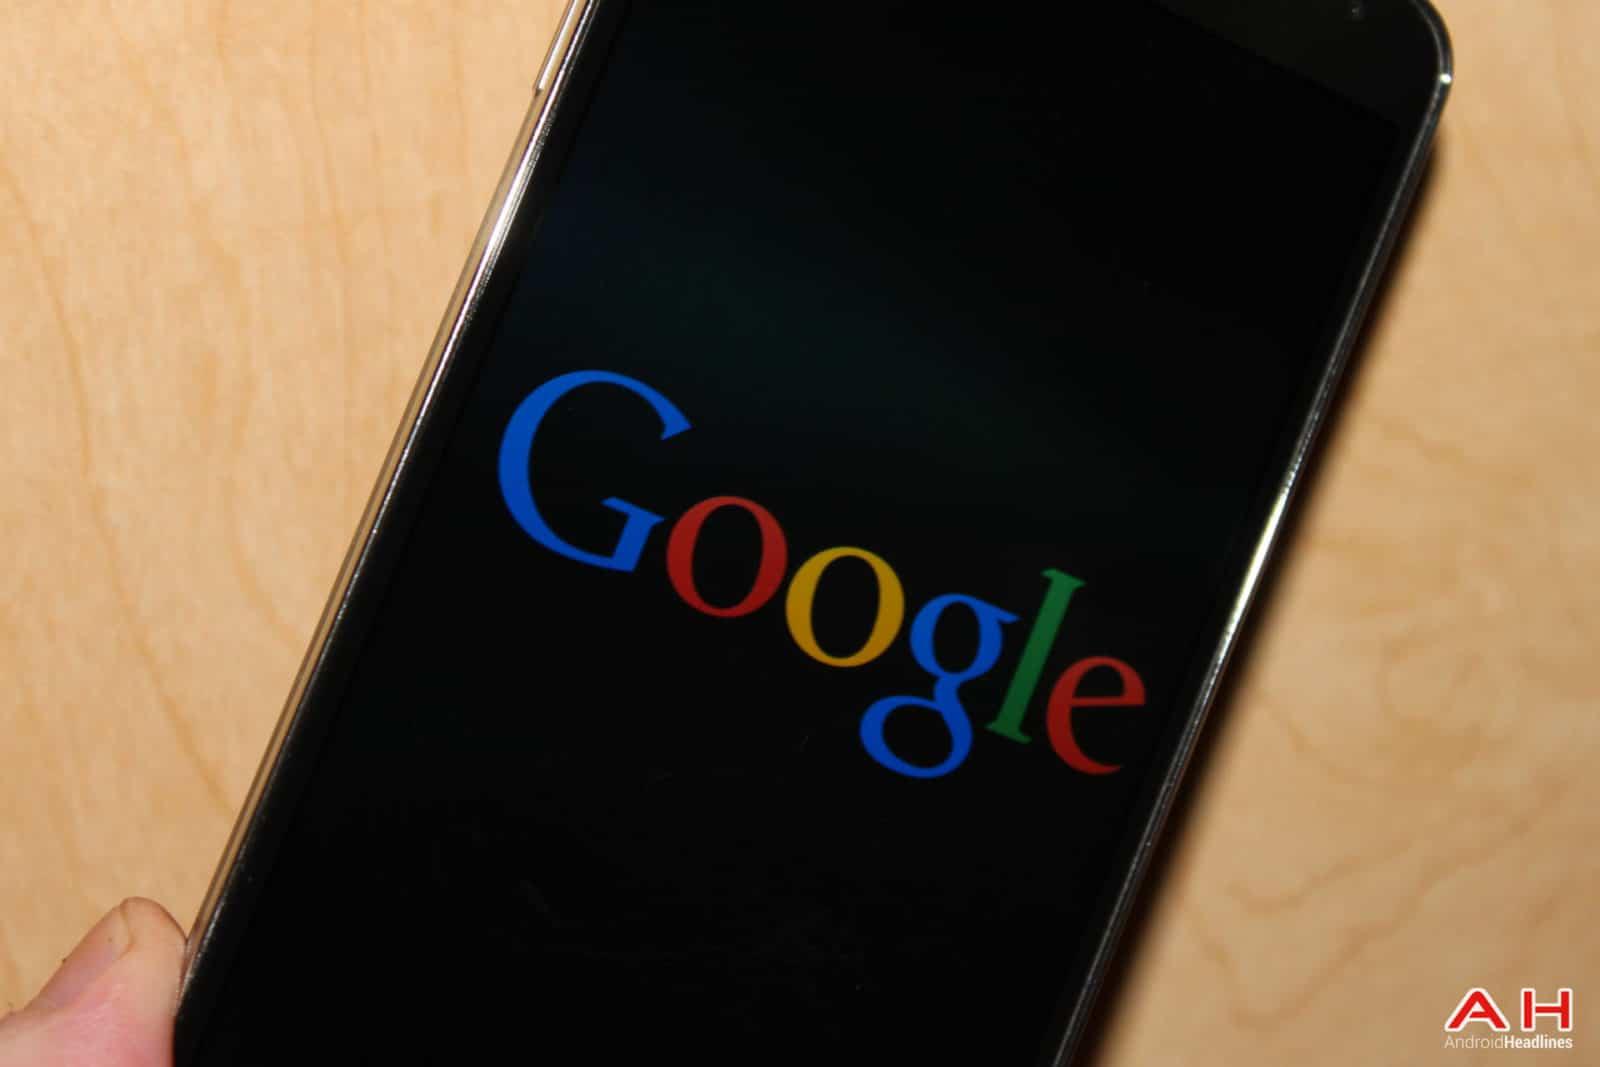 AH Google Logo Colored 1.4